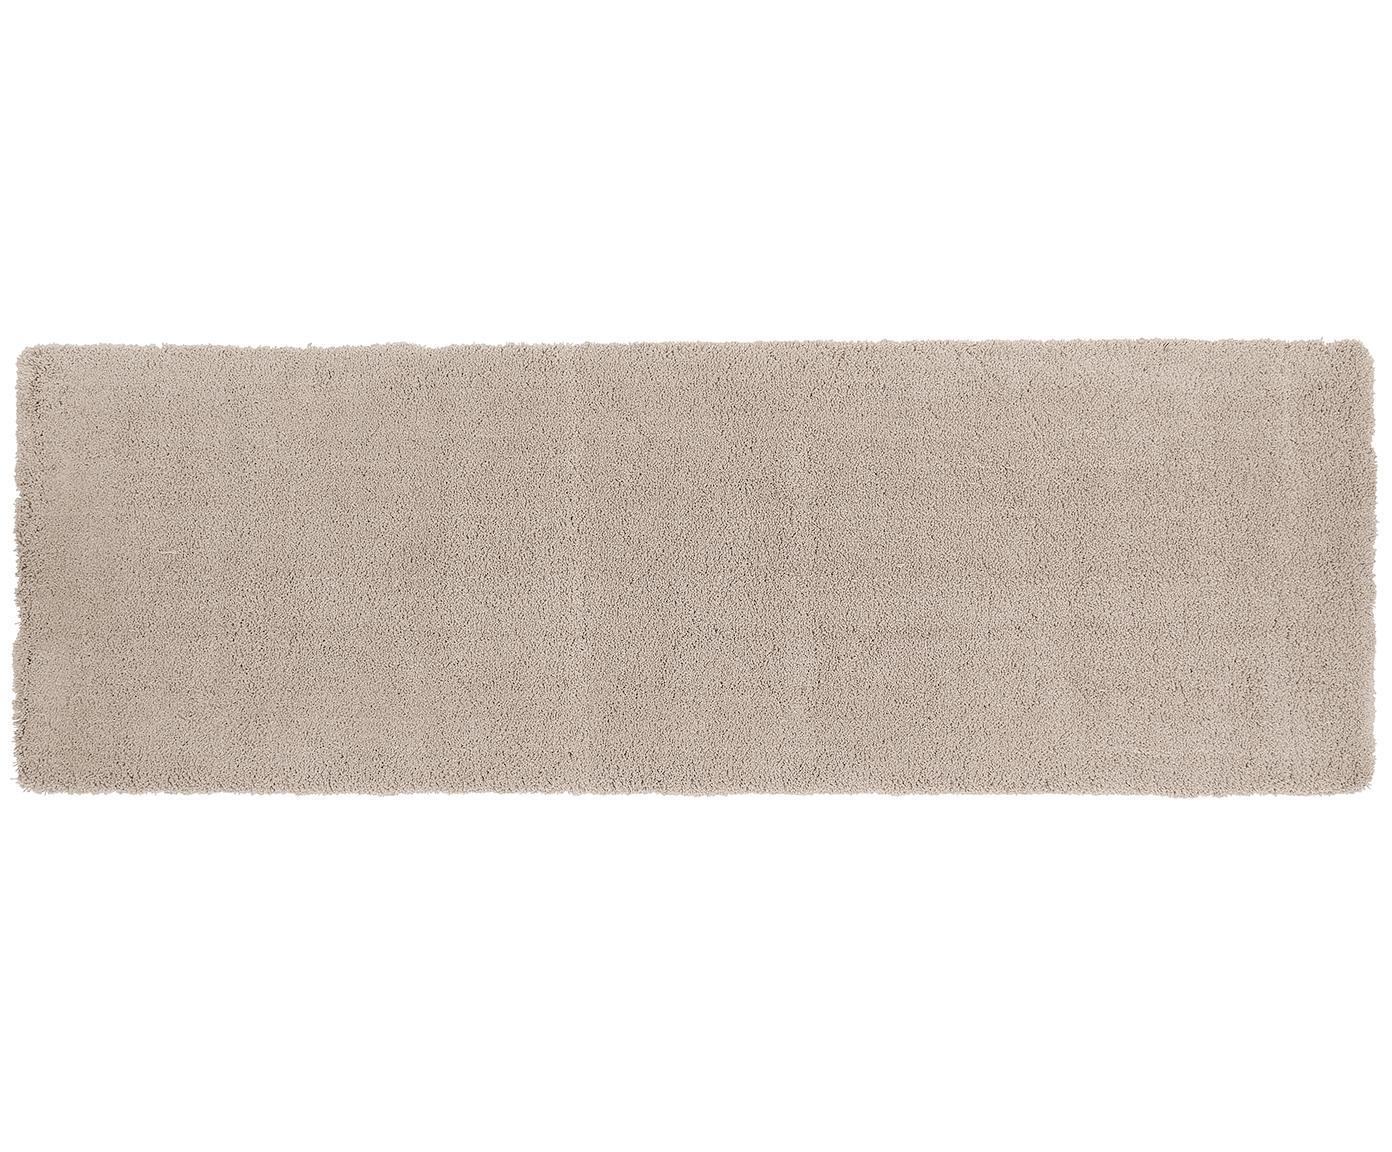 Alfombra de pelo largo Leighton, Parte superior: 100%poliéster (microfibr, Reverso: 100%poliéster, Beige, An 80 x L 250 cm